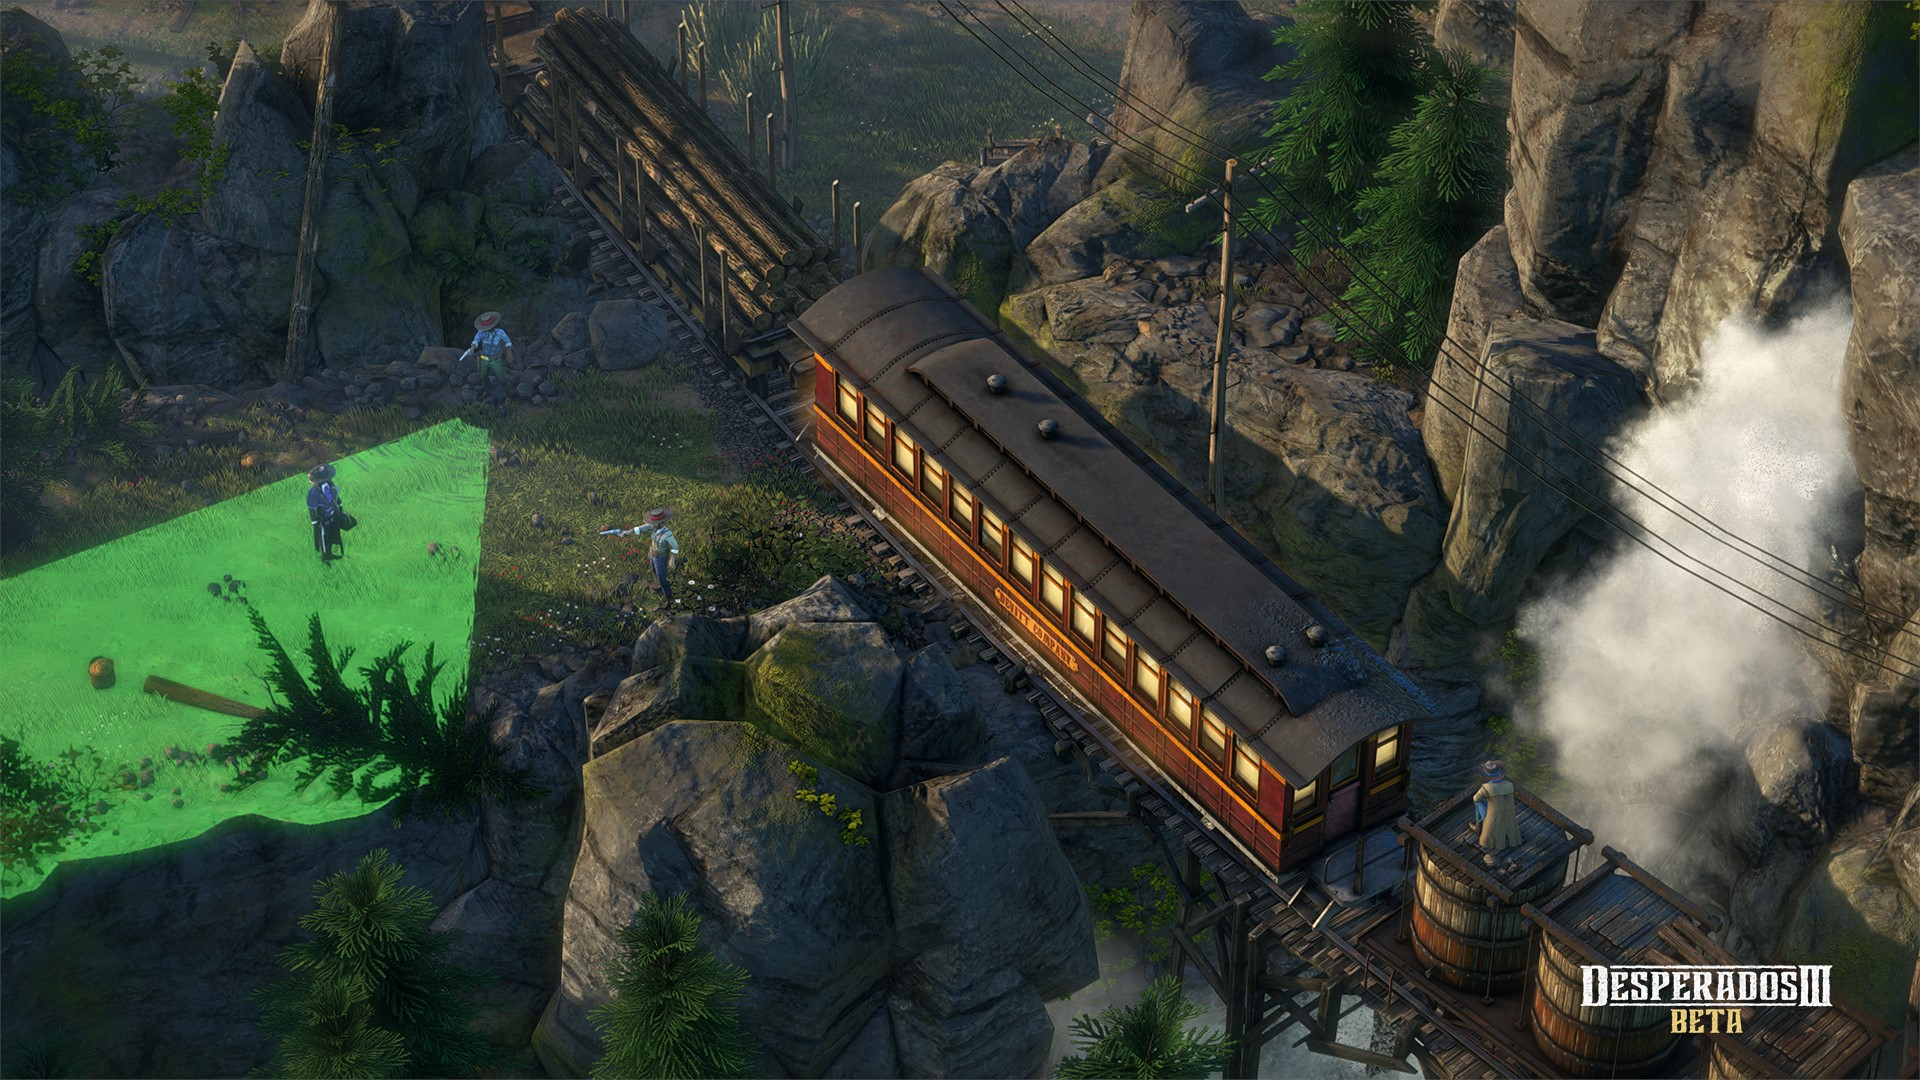 Choose Your Adventure With New Desperados Iii Interactive Trailer Gamespace Com